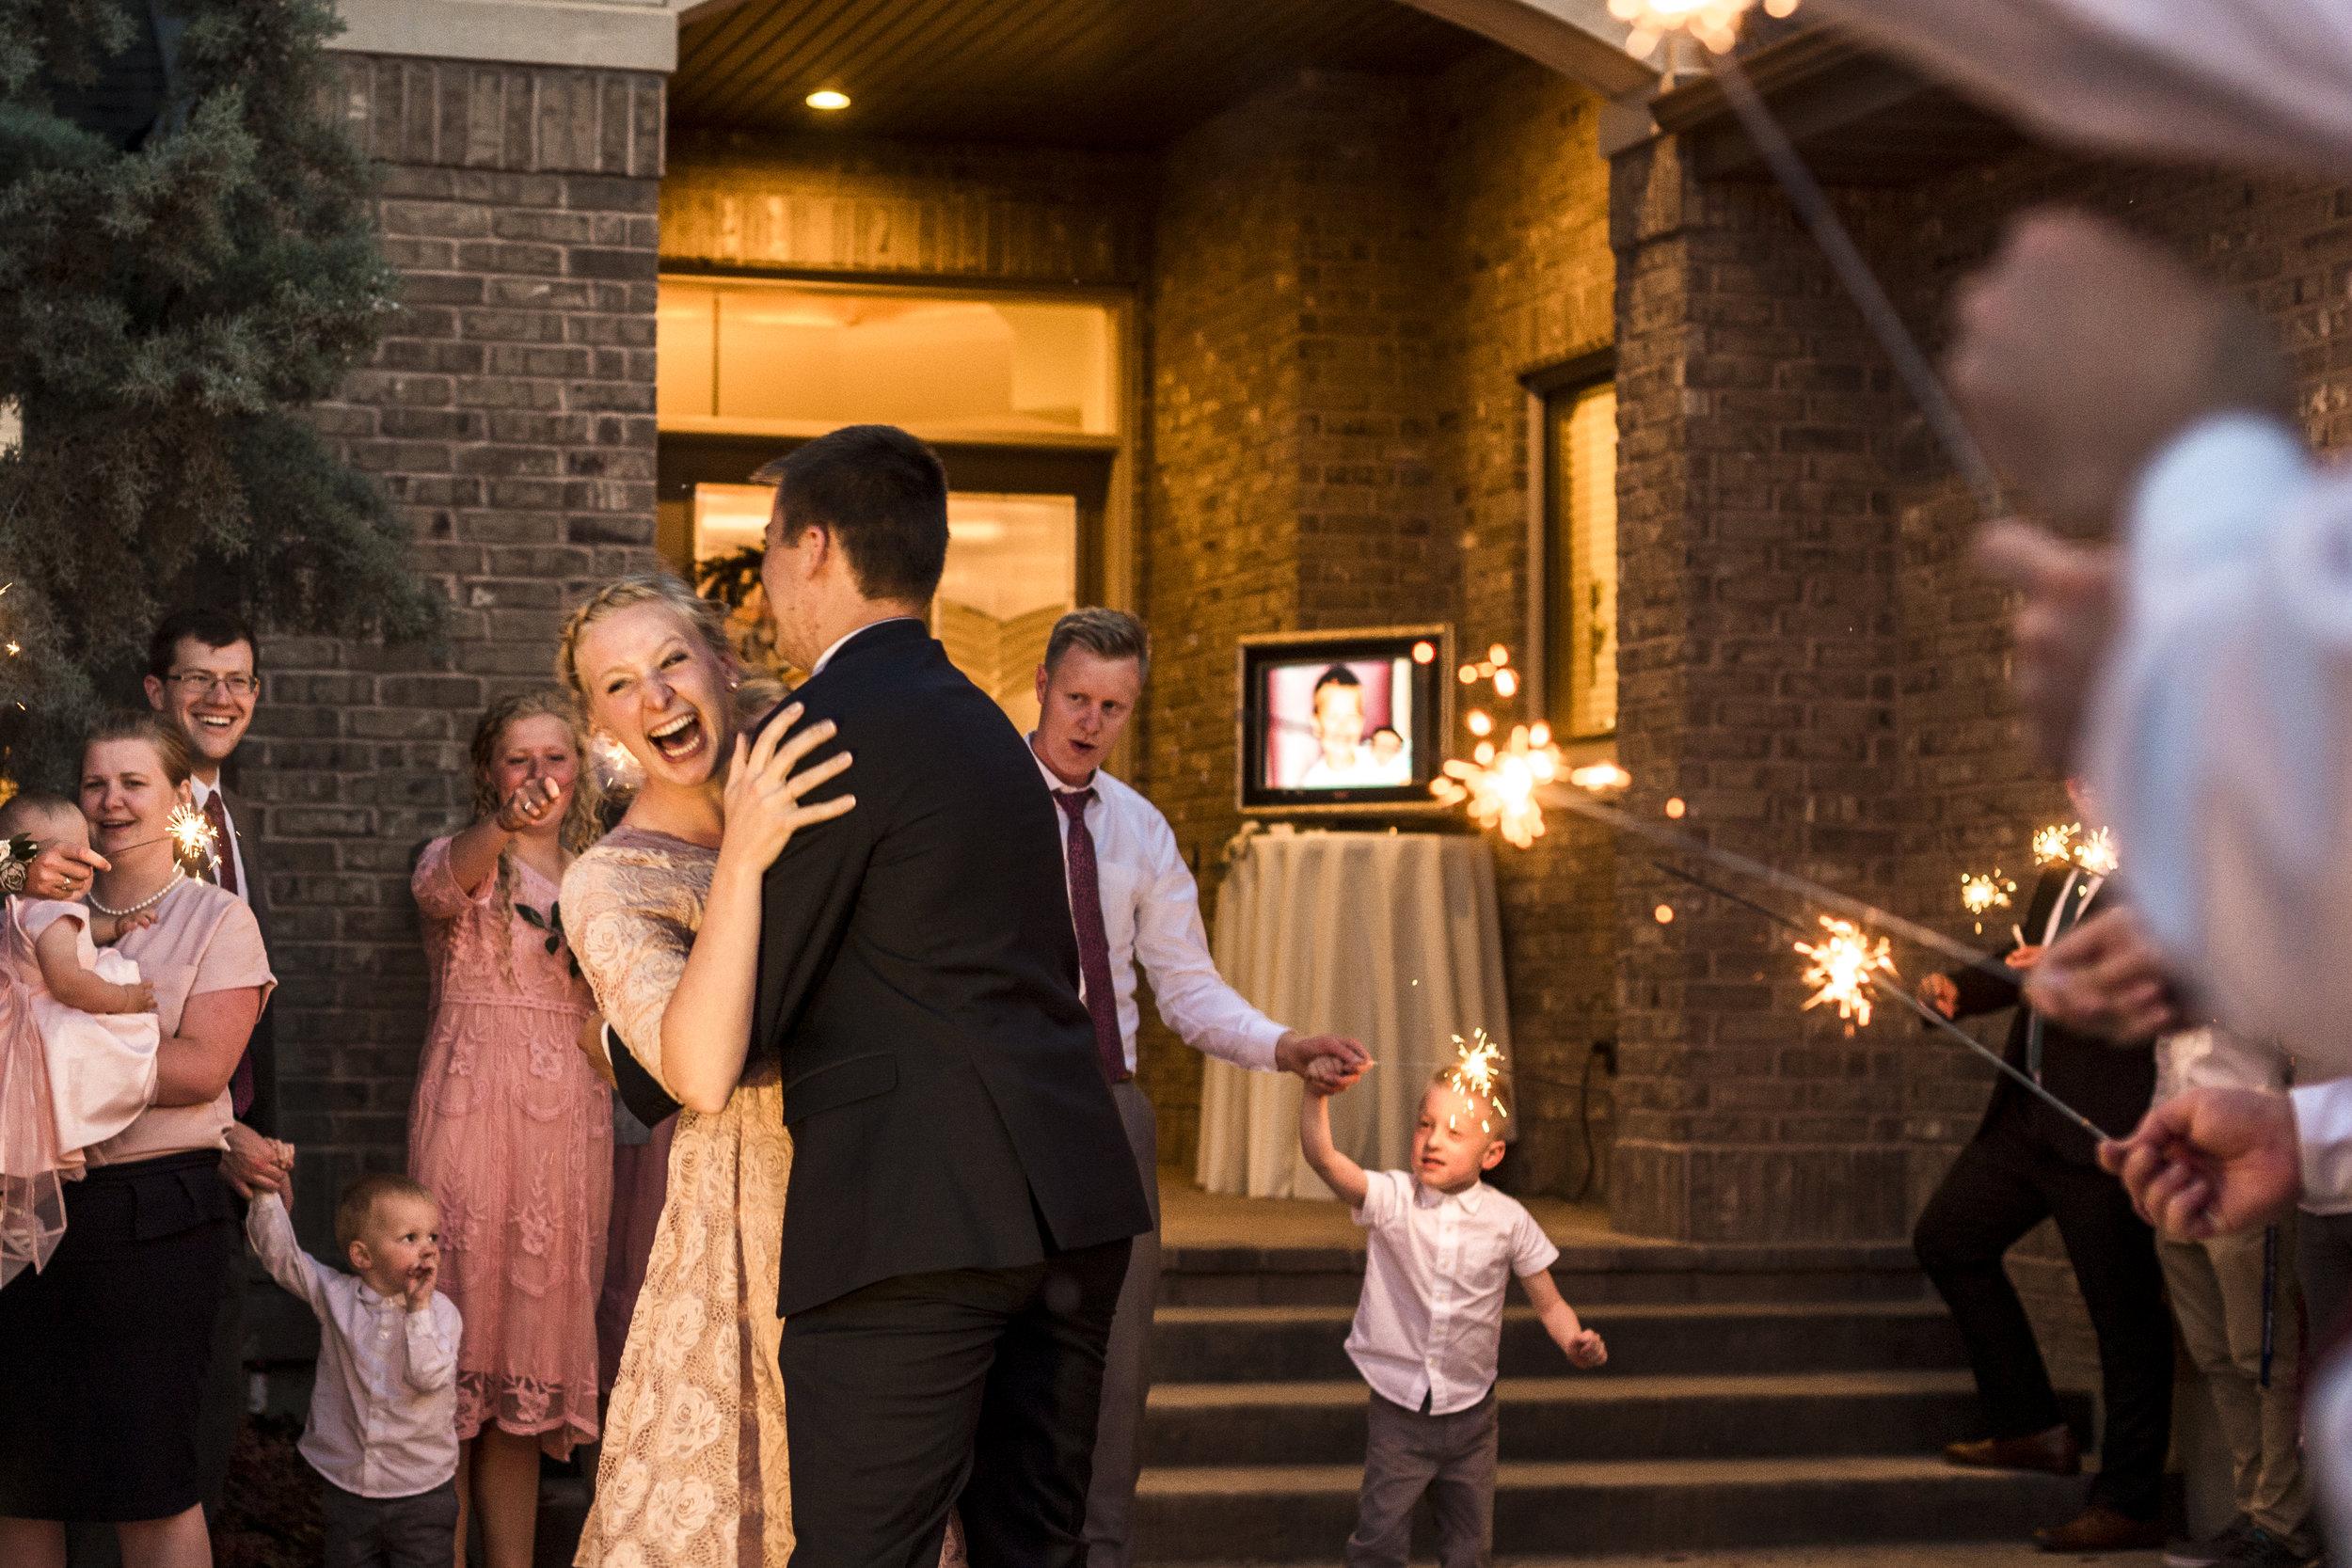 LDS Summer Wedding | South Jordan, Utah Wedding Photographer| Bri Bergman Photography 35.JPG